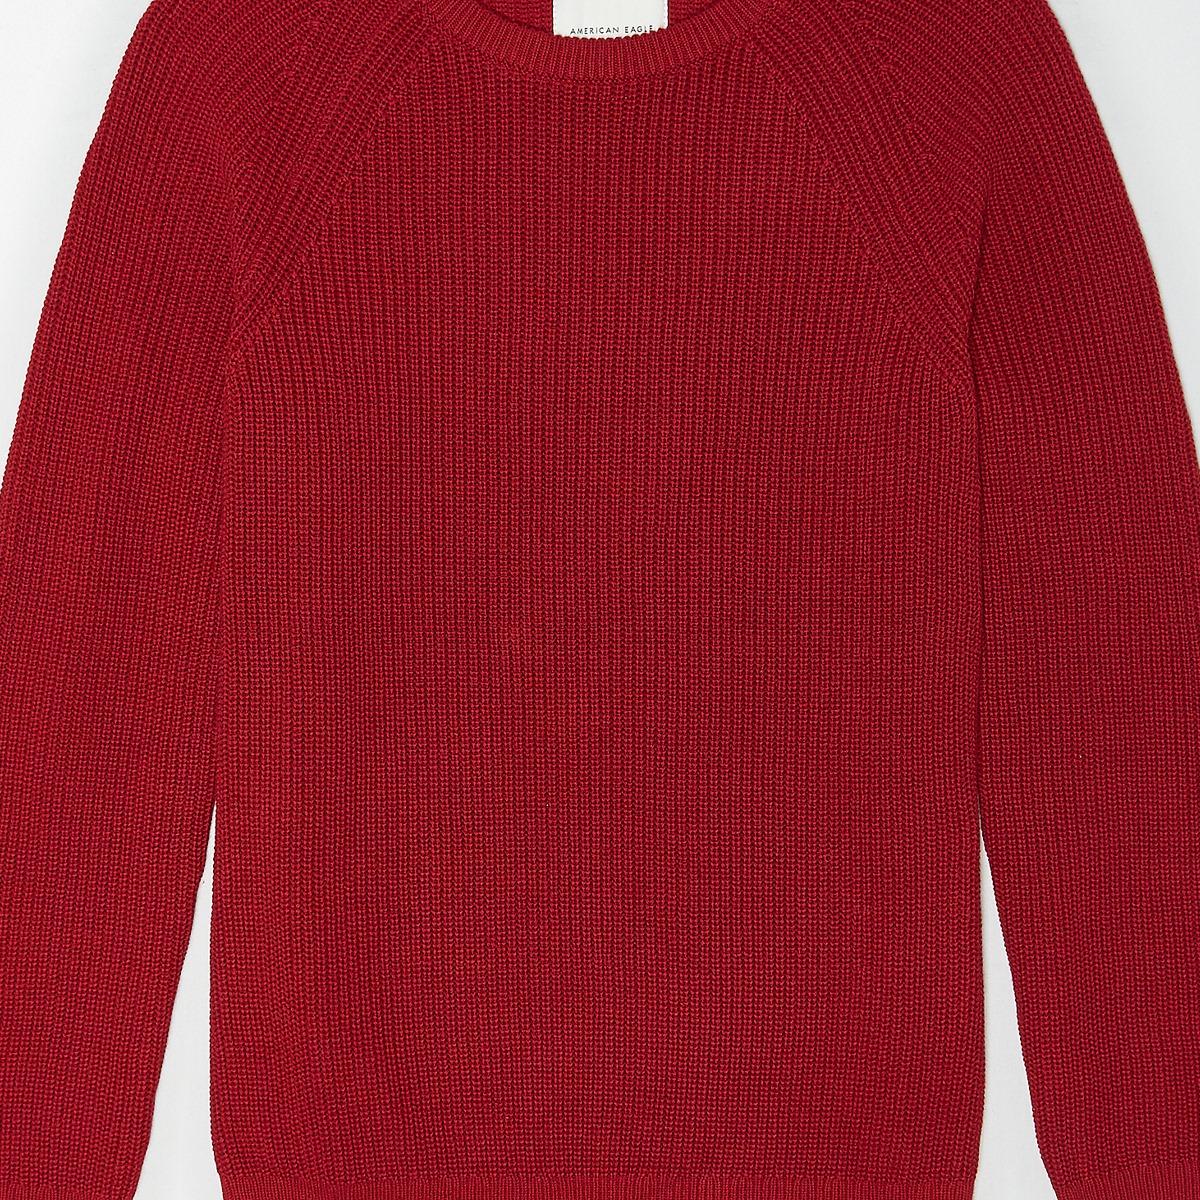 AEO Raglan Sleeve Crew Neck Sweater